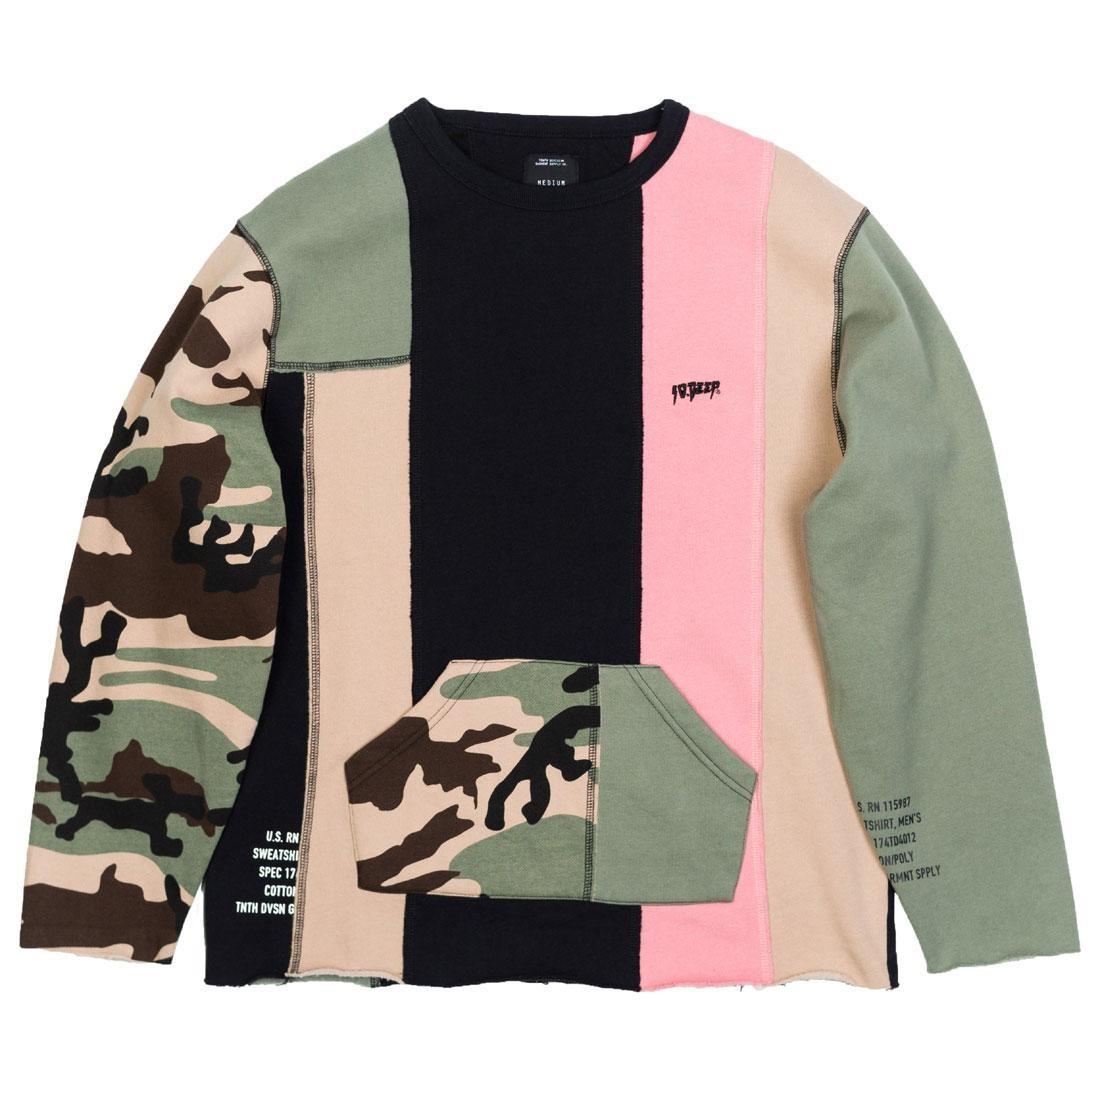 10 Deep Men Many Wars Crewneck Sweater (camo / multi)